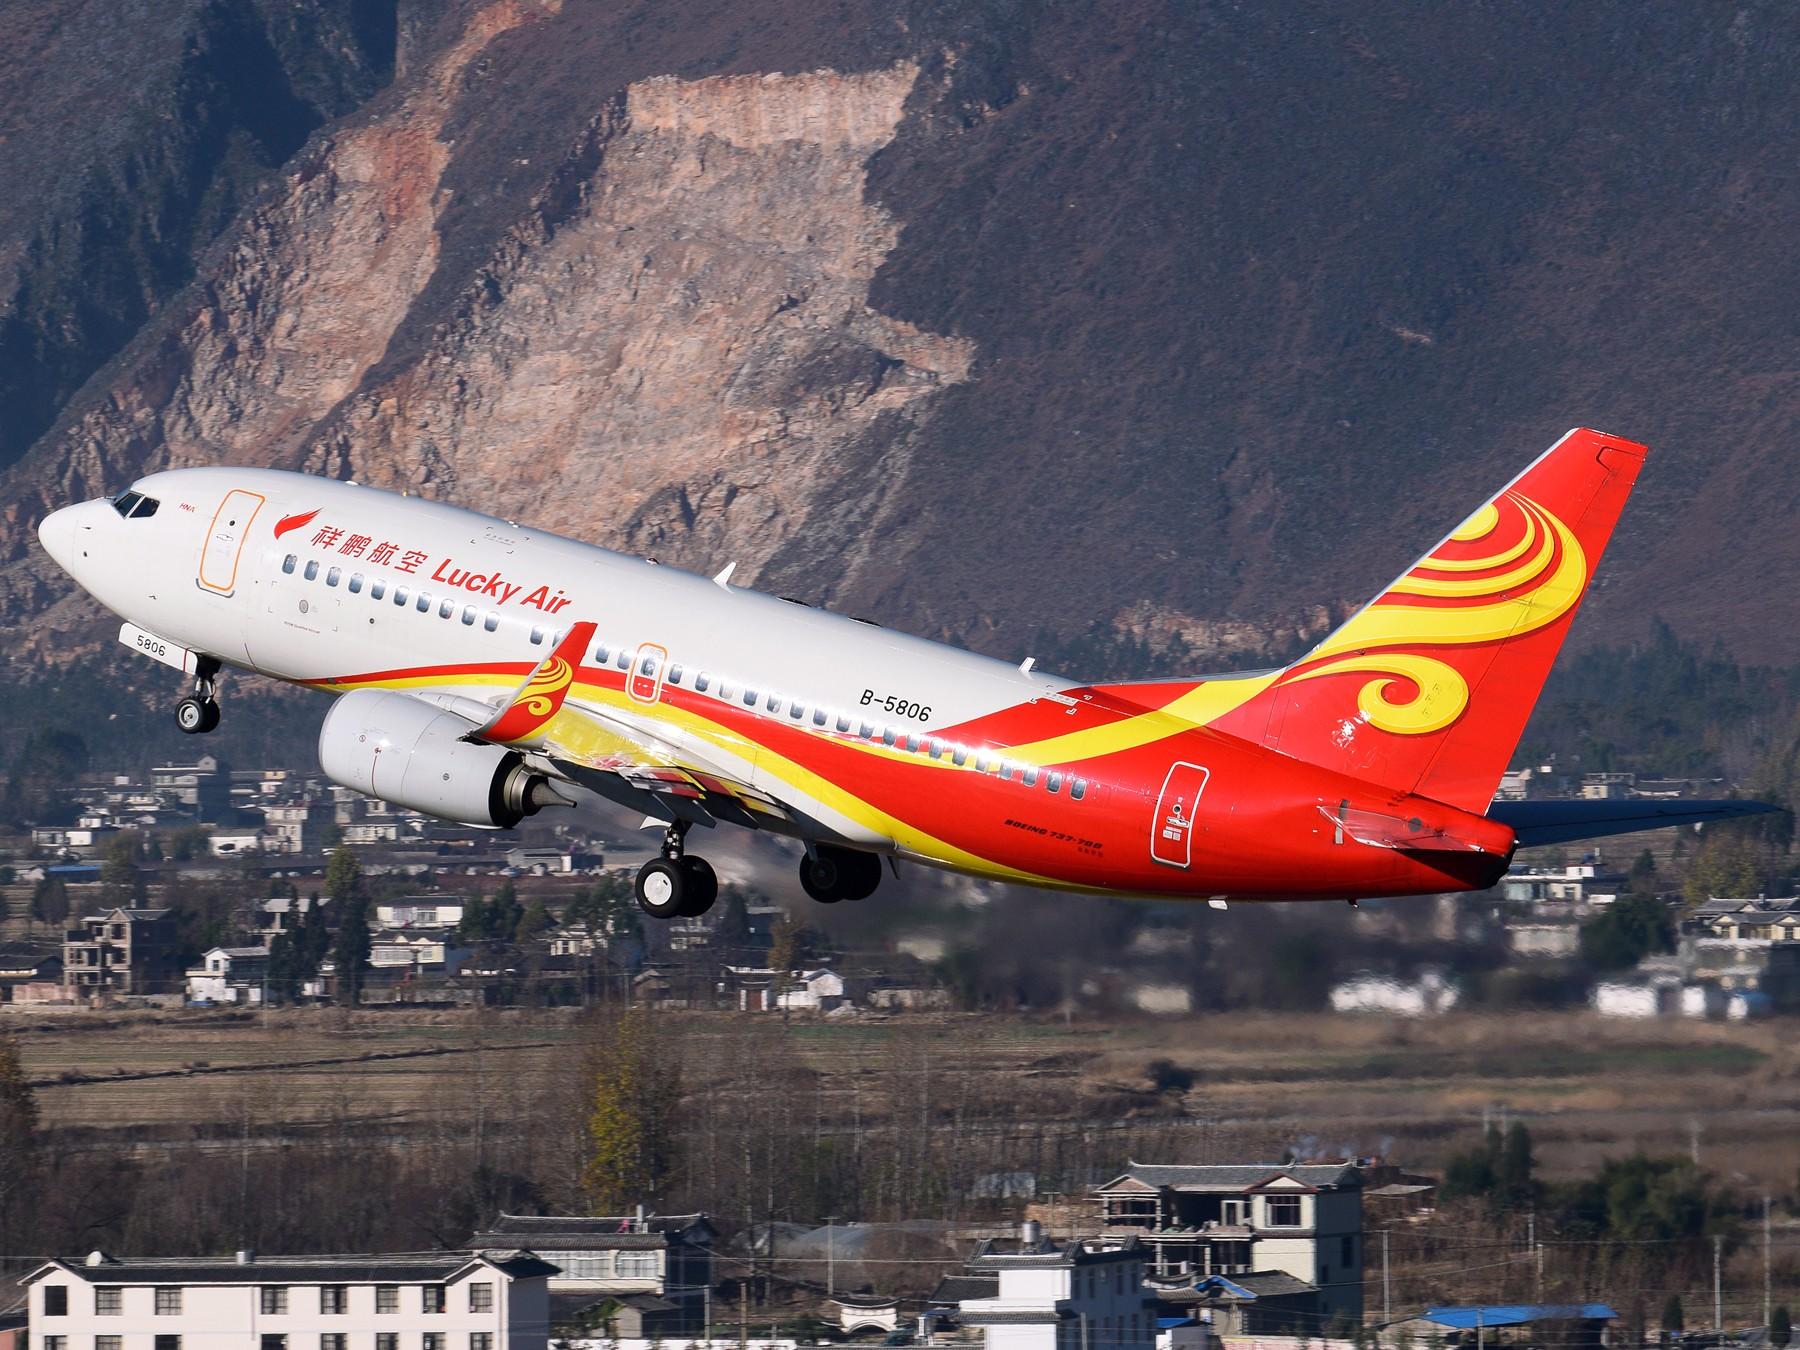 Re:[原创]补发的拍机游记---Day Trip for 丽江三义 BOEING 737-700 B-5806 中国丽江三义机场